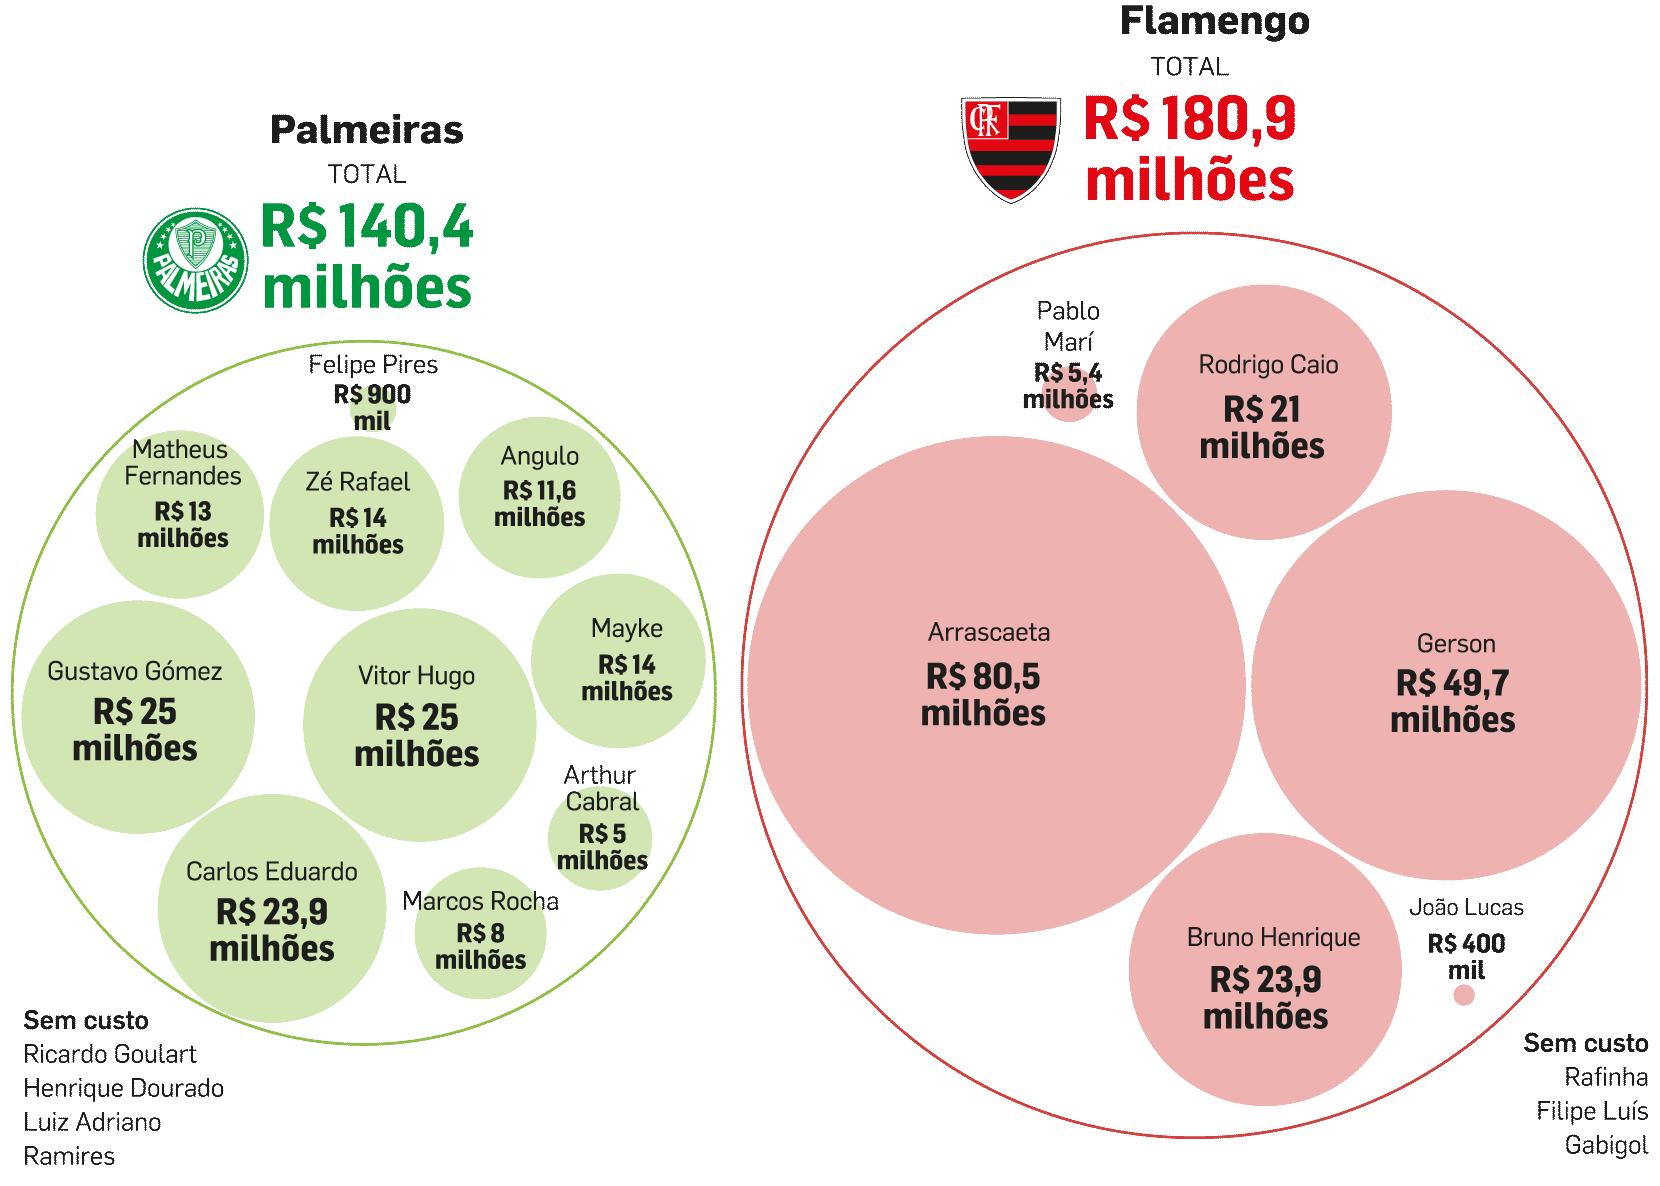 PalmeirasFlamengoweb-col-3.png